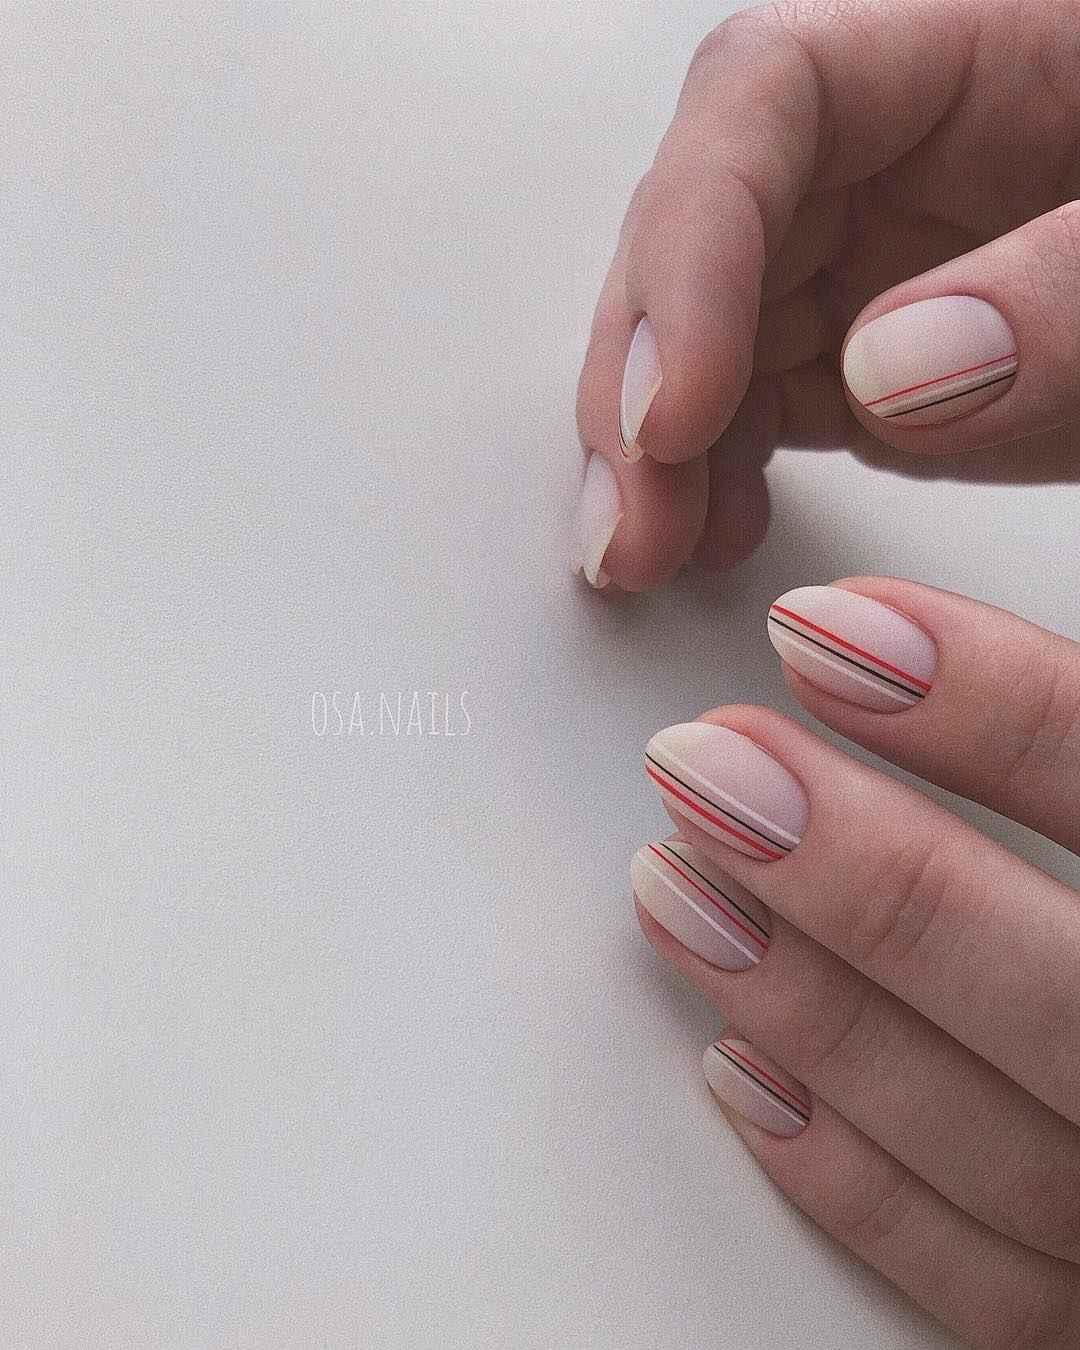 Тренды маникюра на короткие ногти весна 2019 фото_5